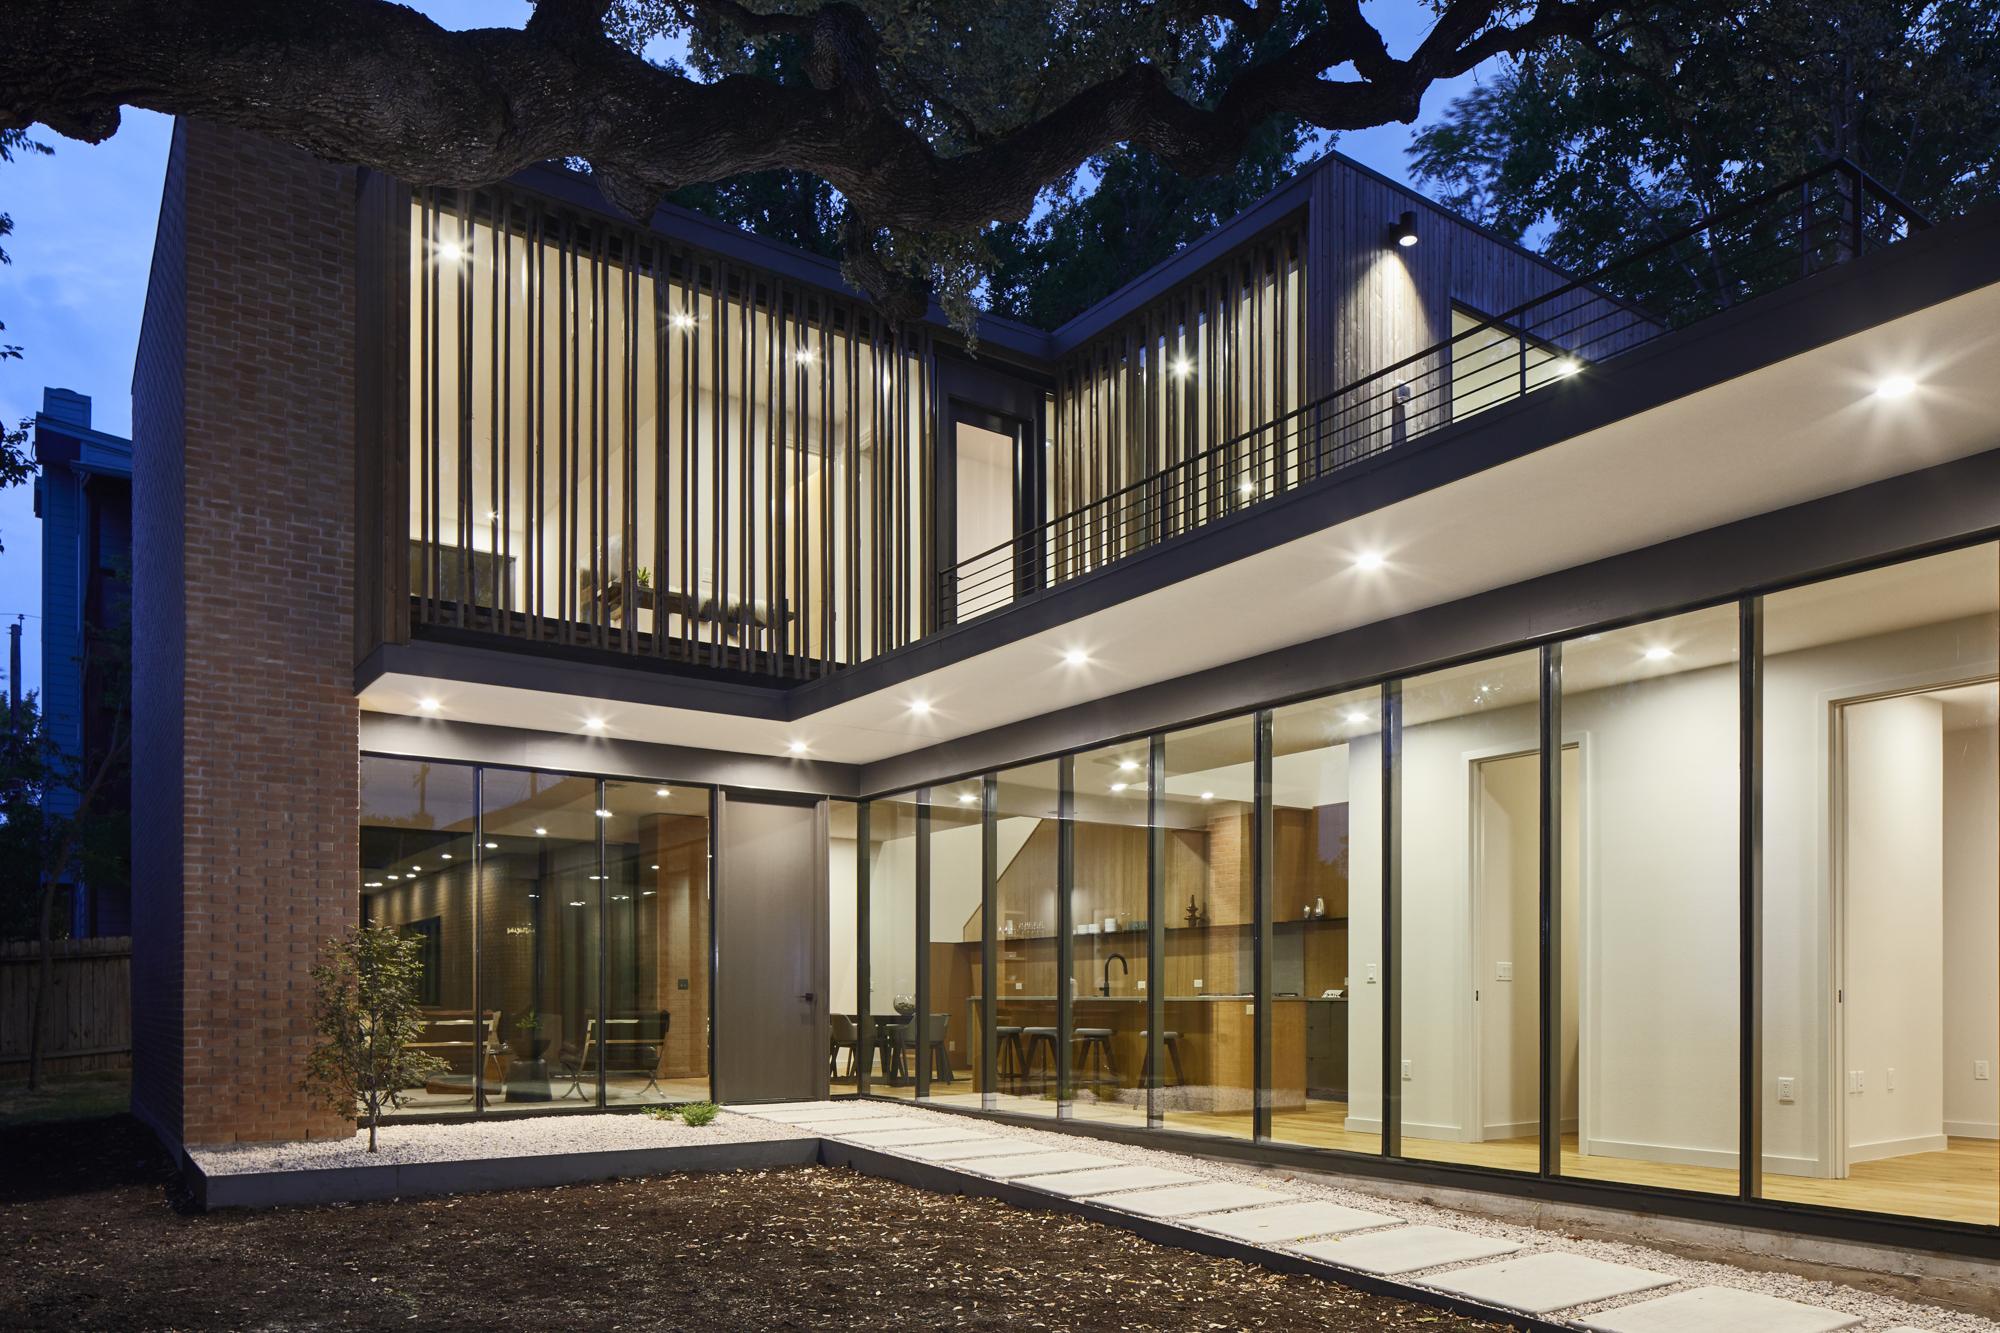 Photo of a contemporary home